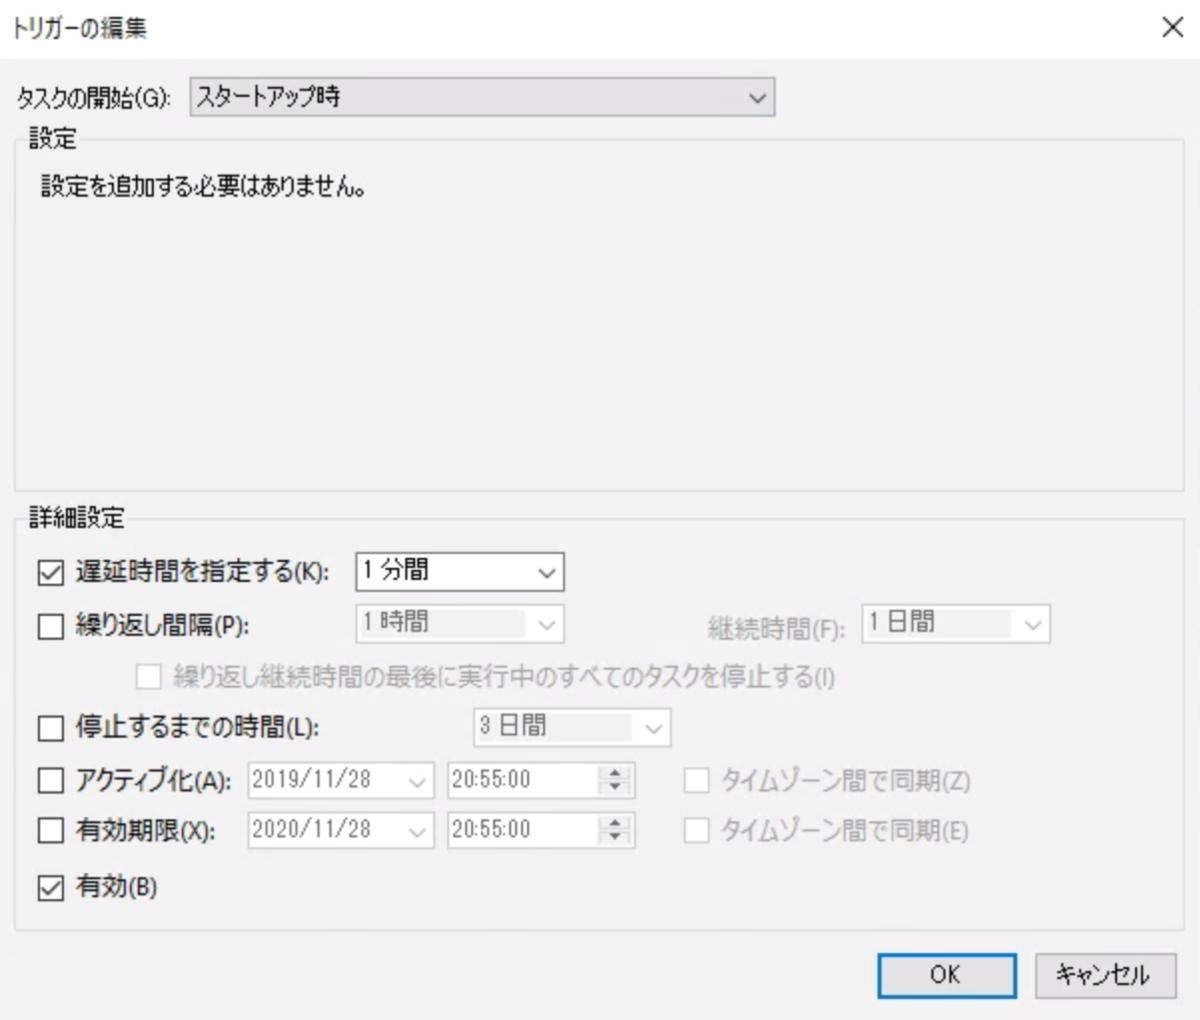 f:id:onsanai:20191128205552p:plain:w300